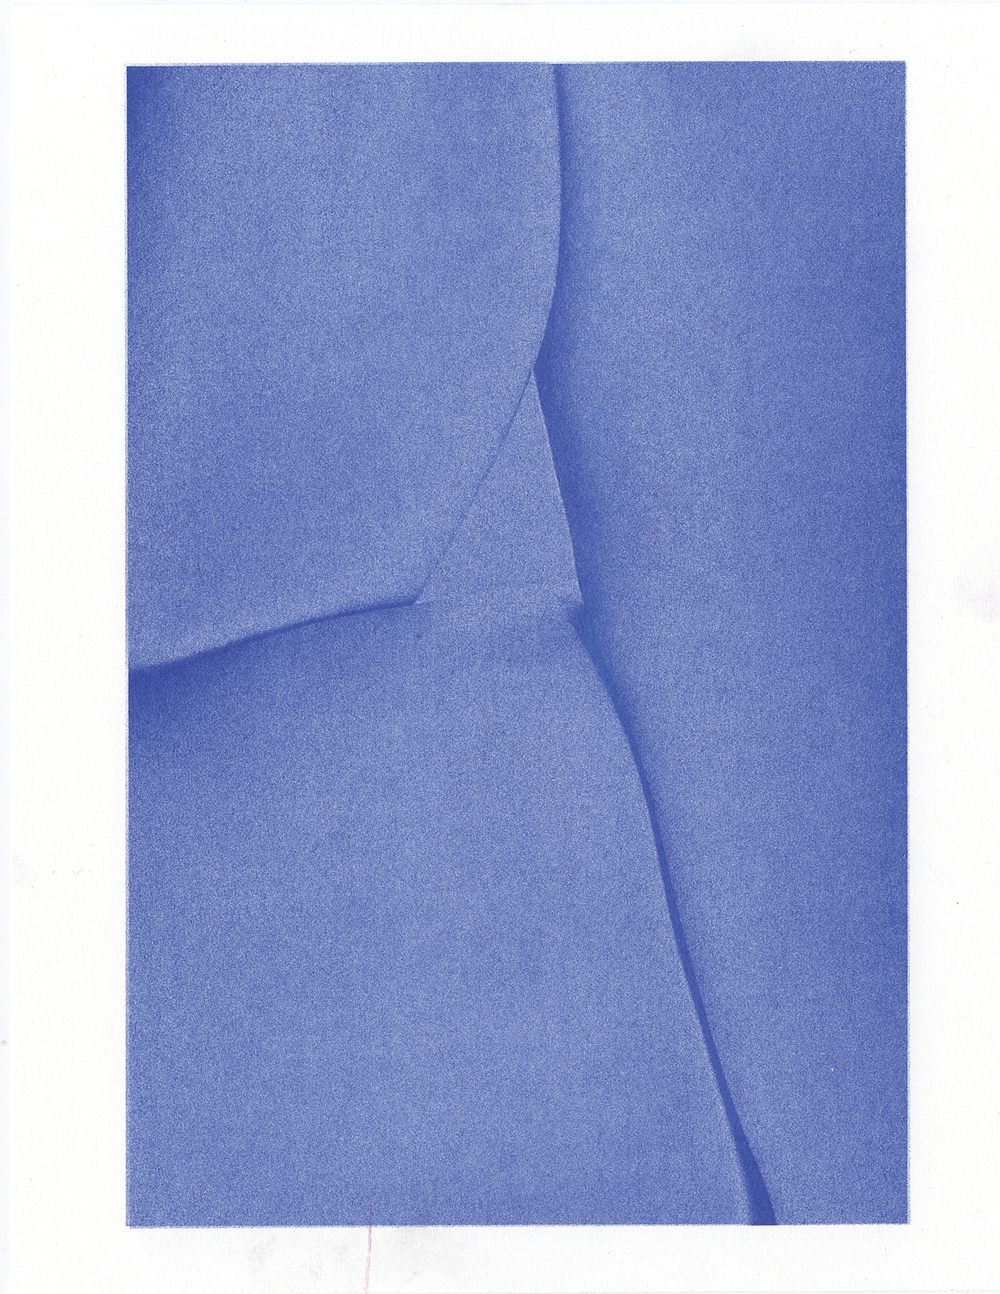 LELE-DASHWOOD_48-INVERT_BLUE_1.jpg